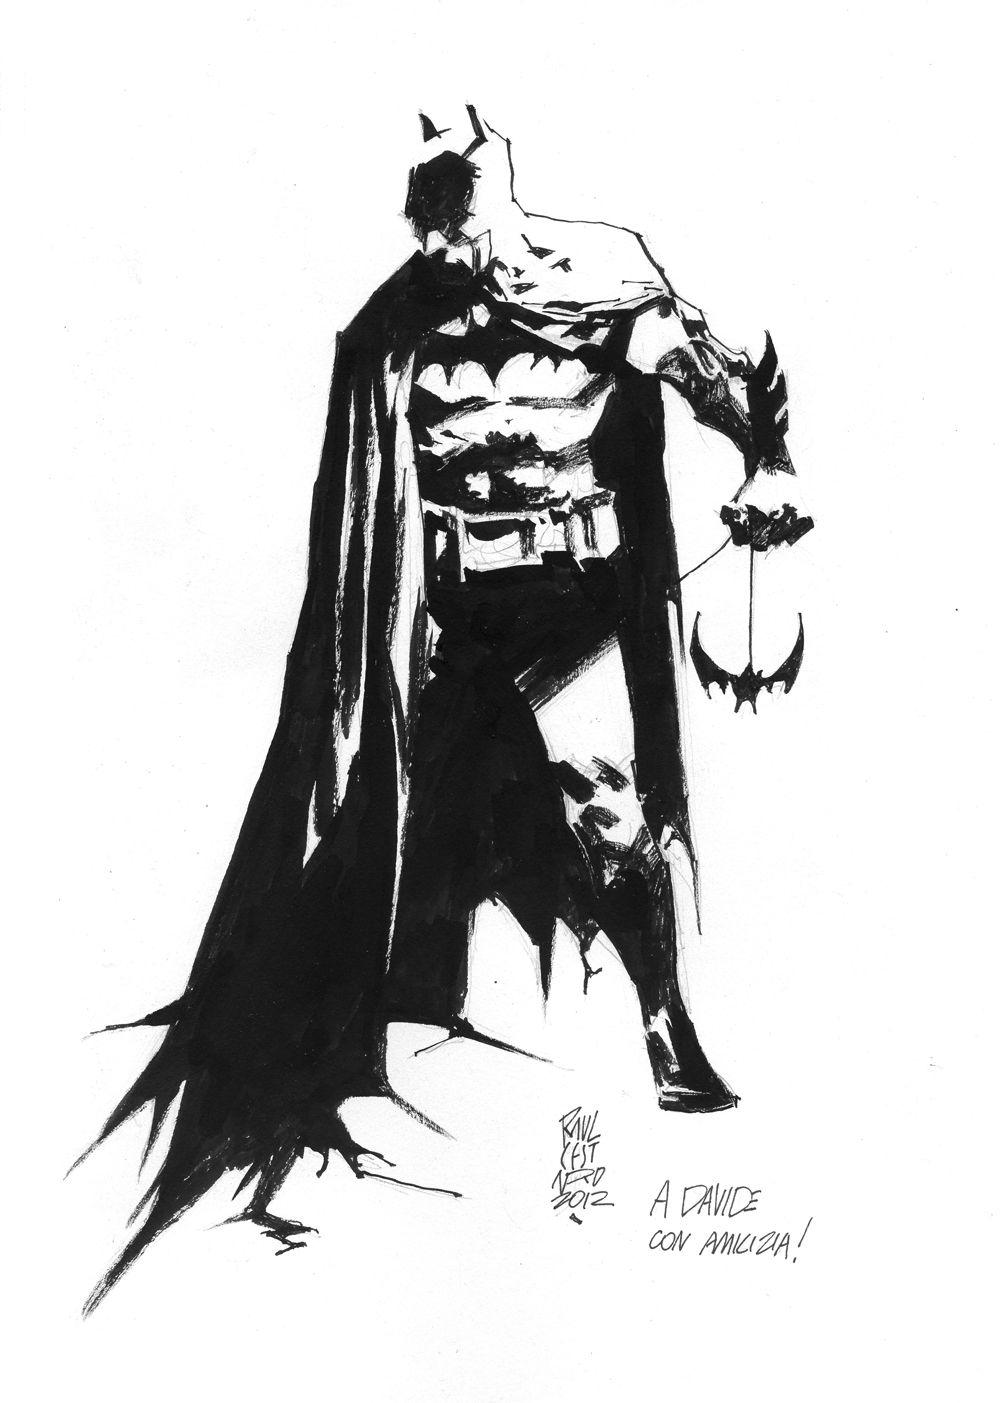 Raul Cestaro With Images Batman Art Comics Logo Art